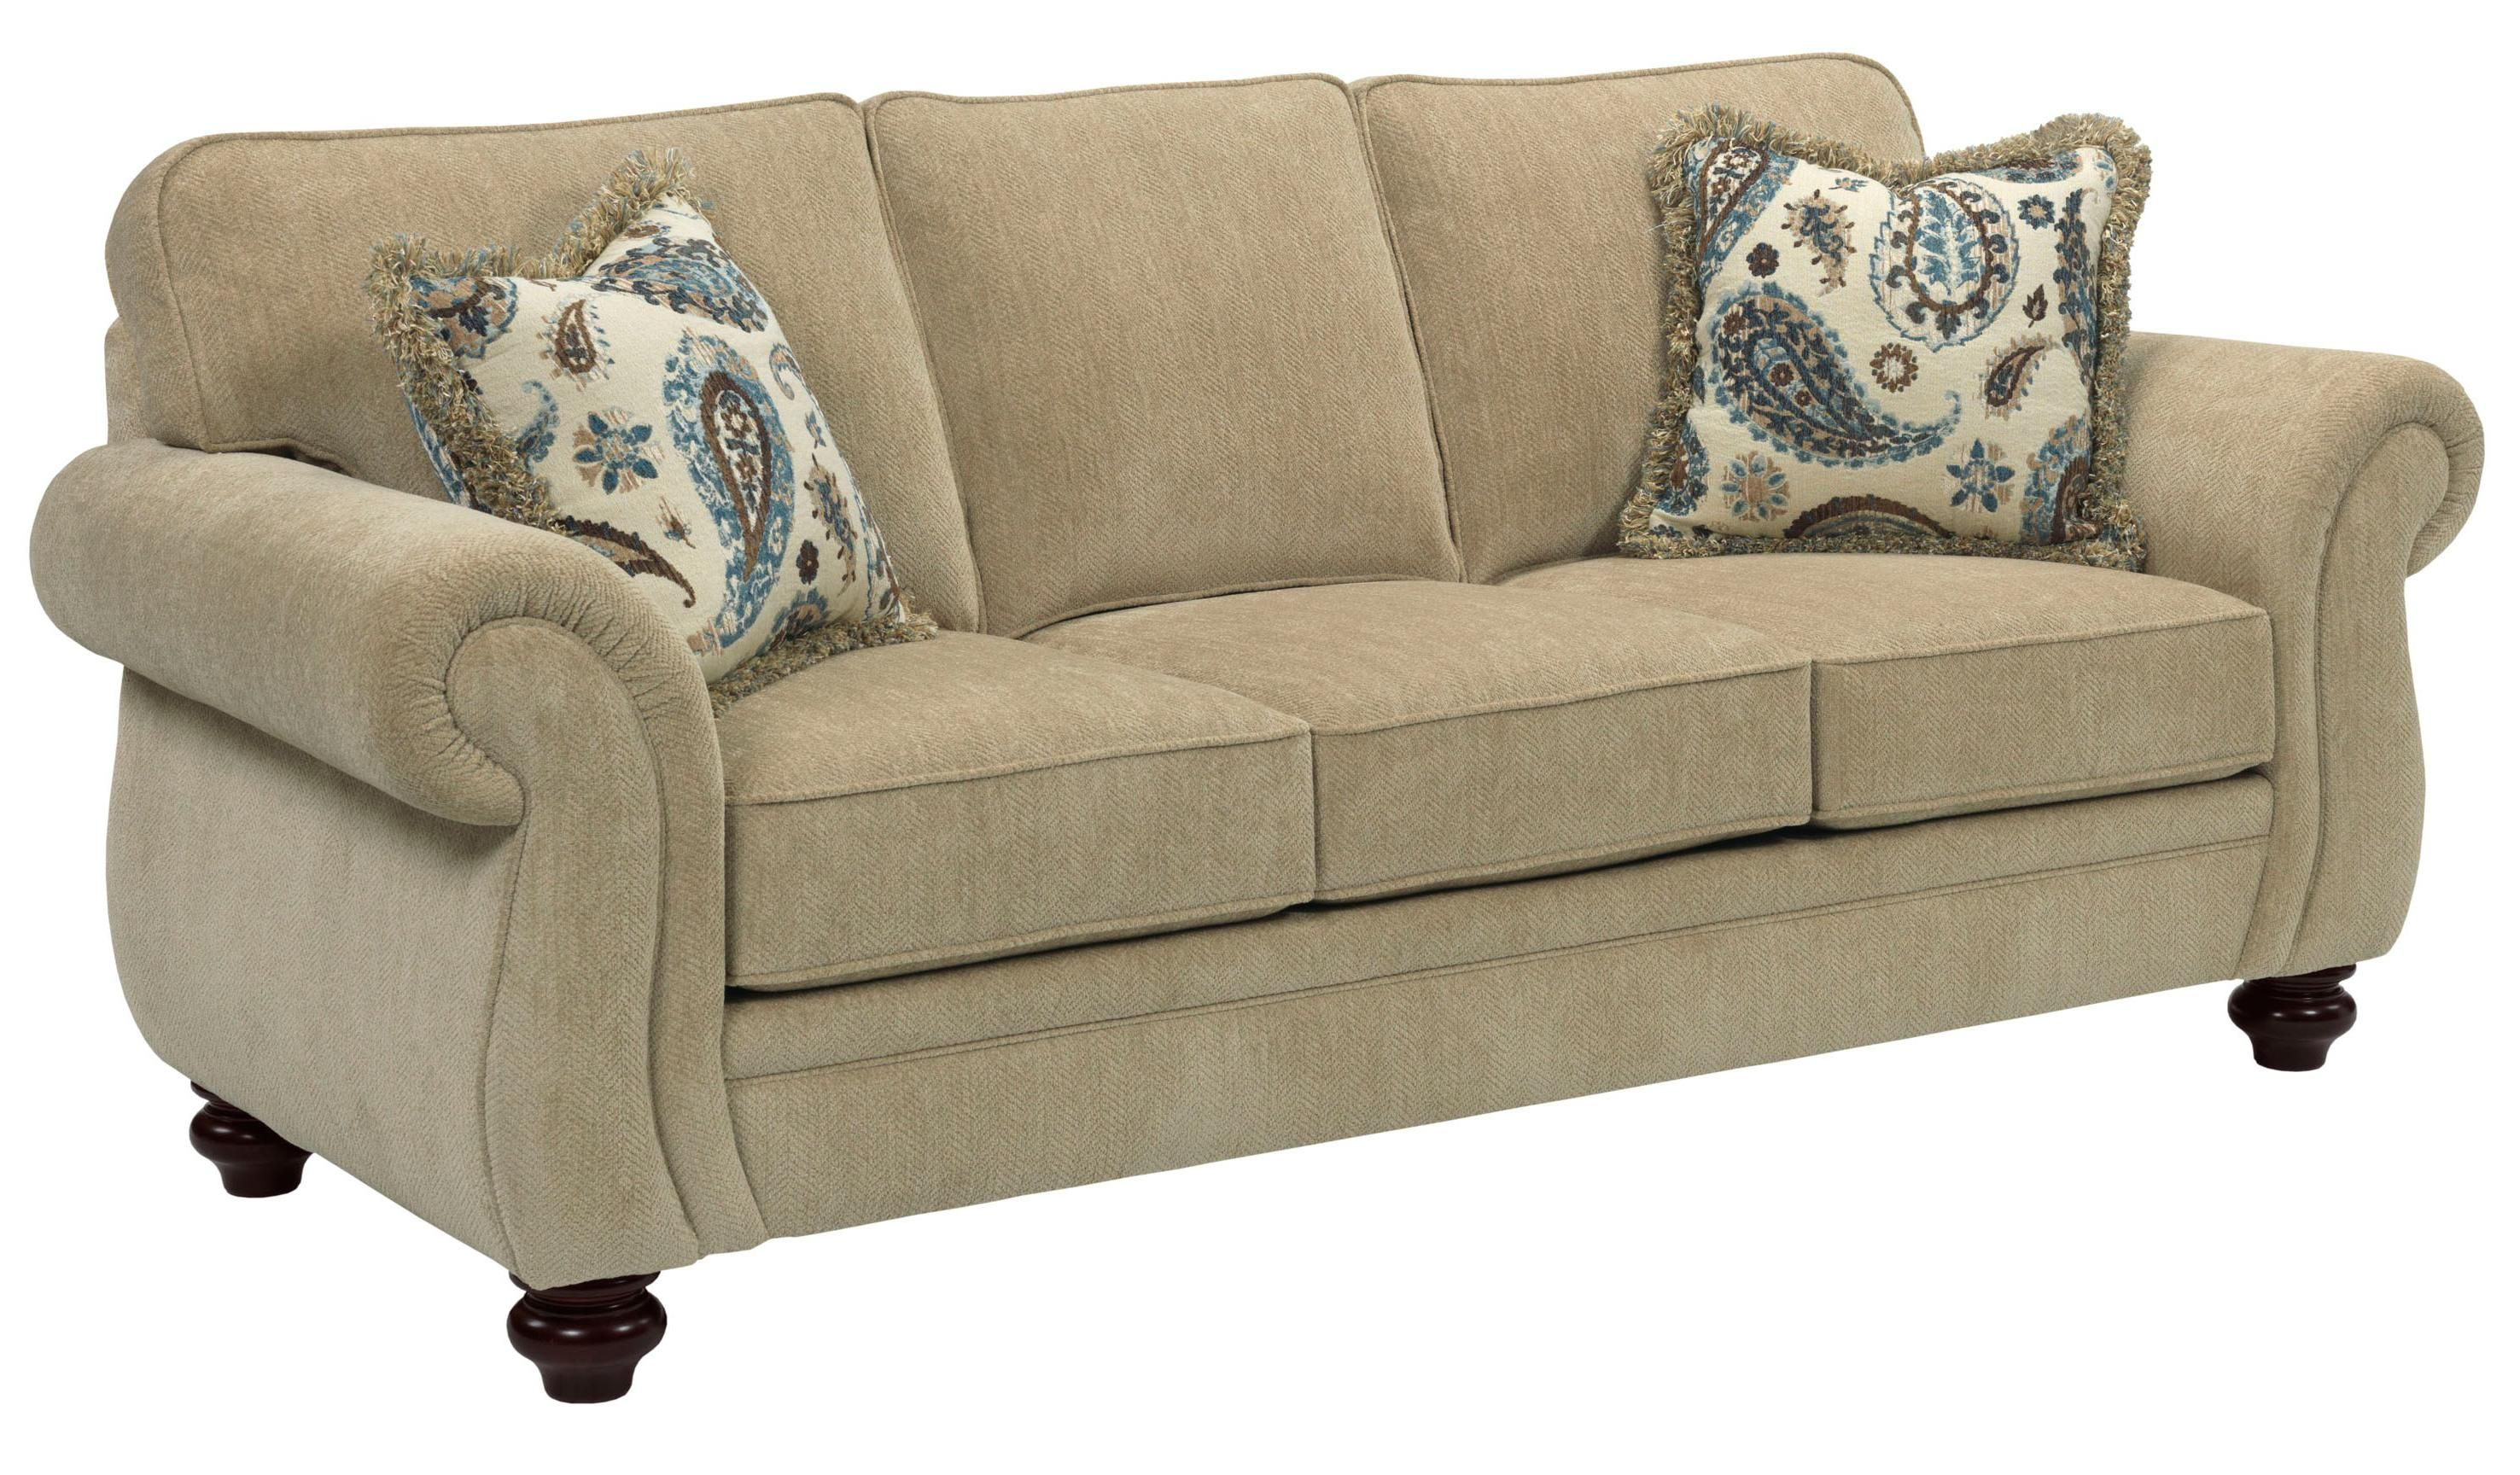 Broyhill Furniture Cassandra Traditional Stationary Sofa